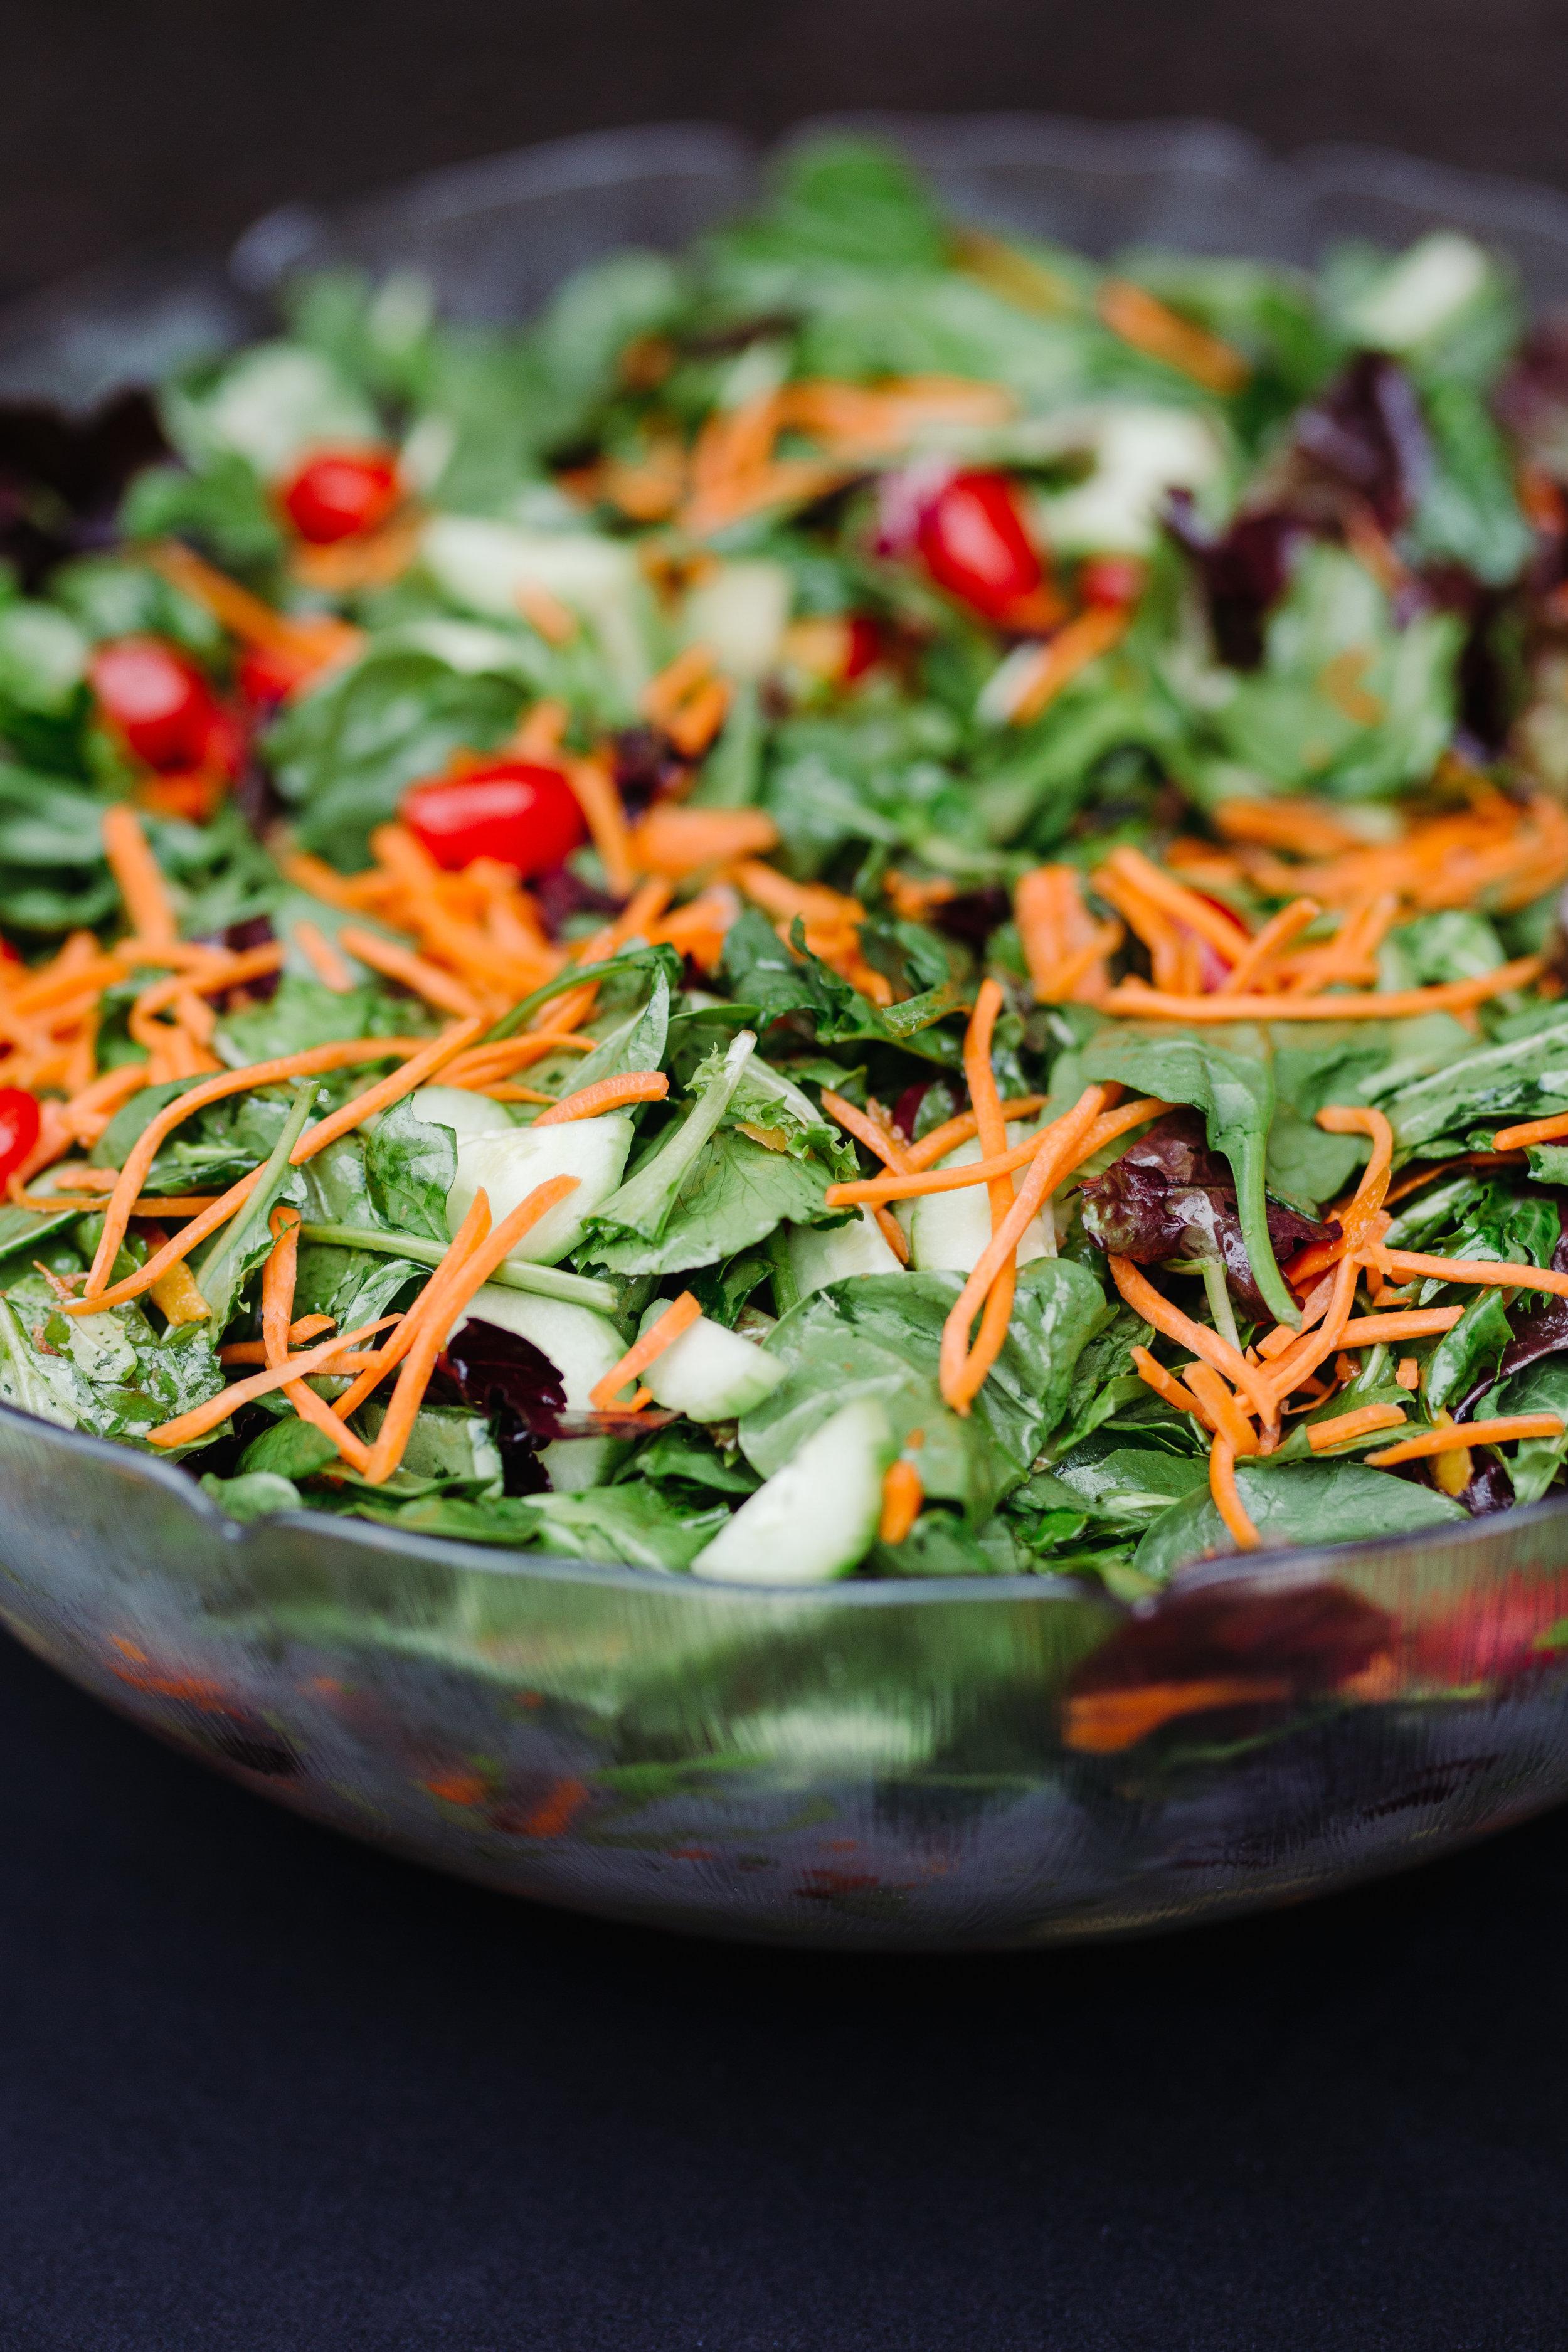 Market fresh salad with citrus vinaigrette dressing